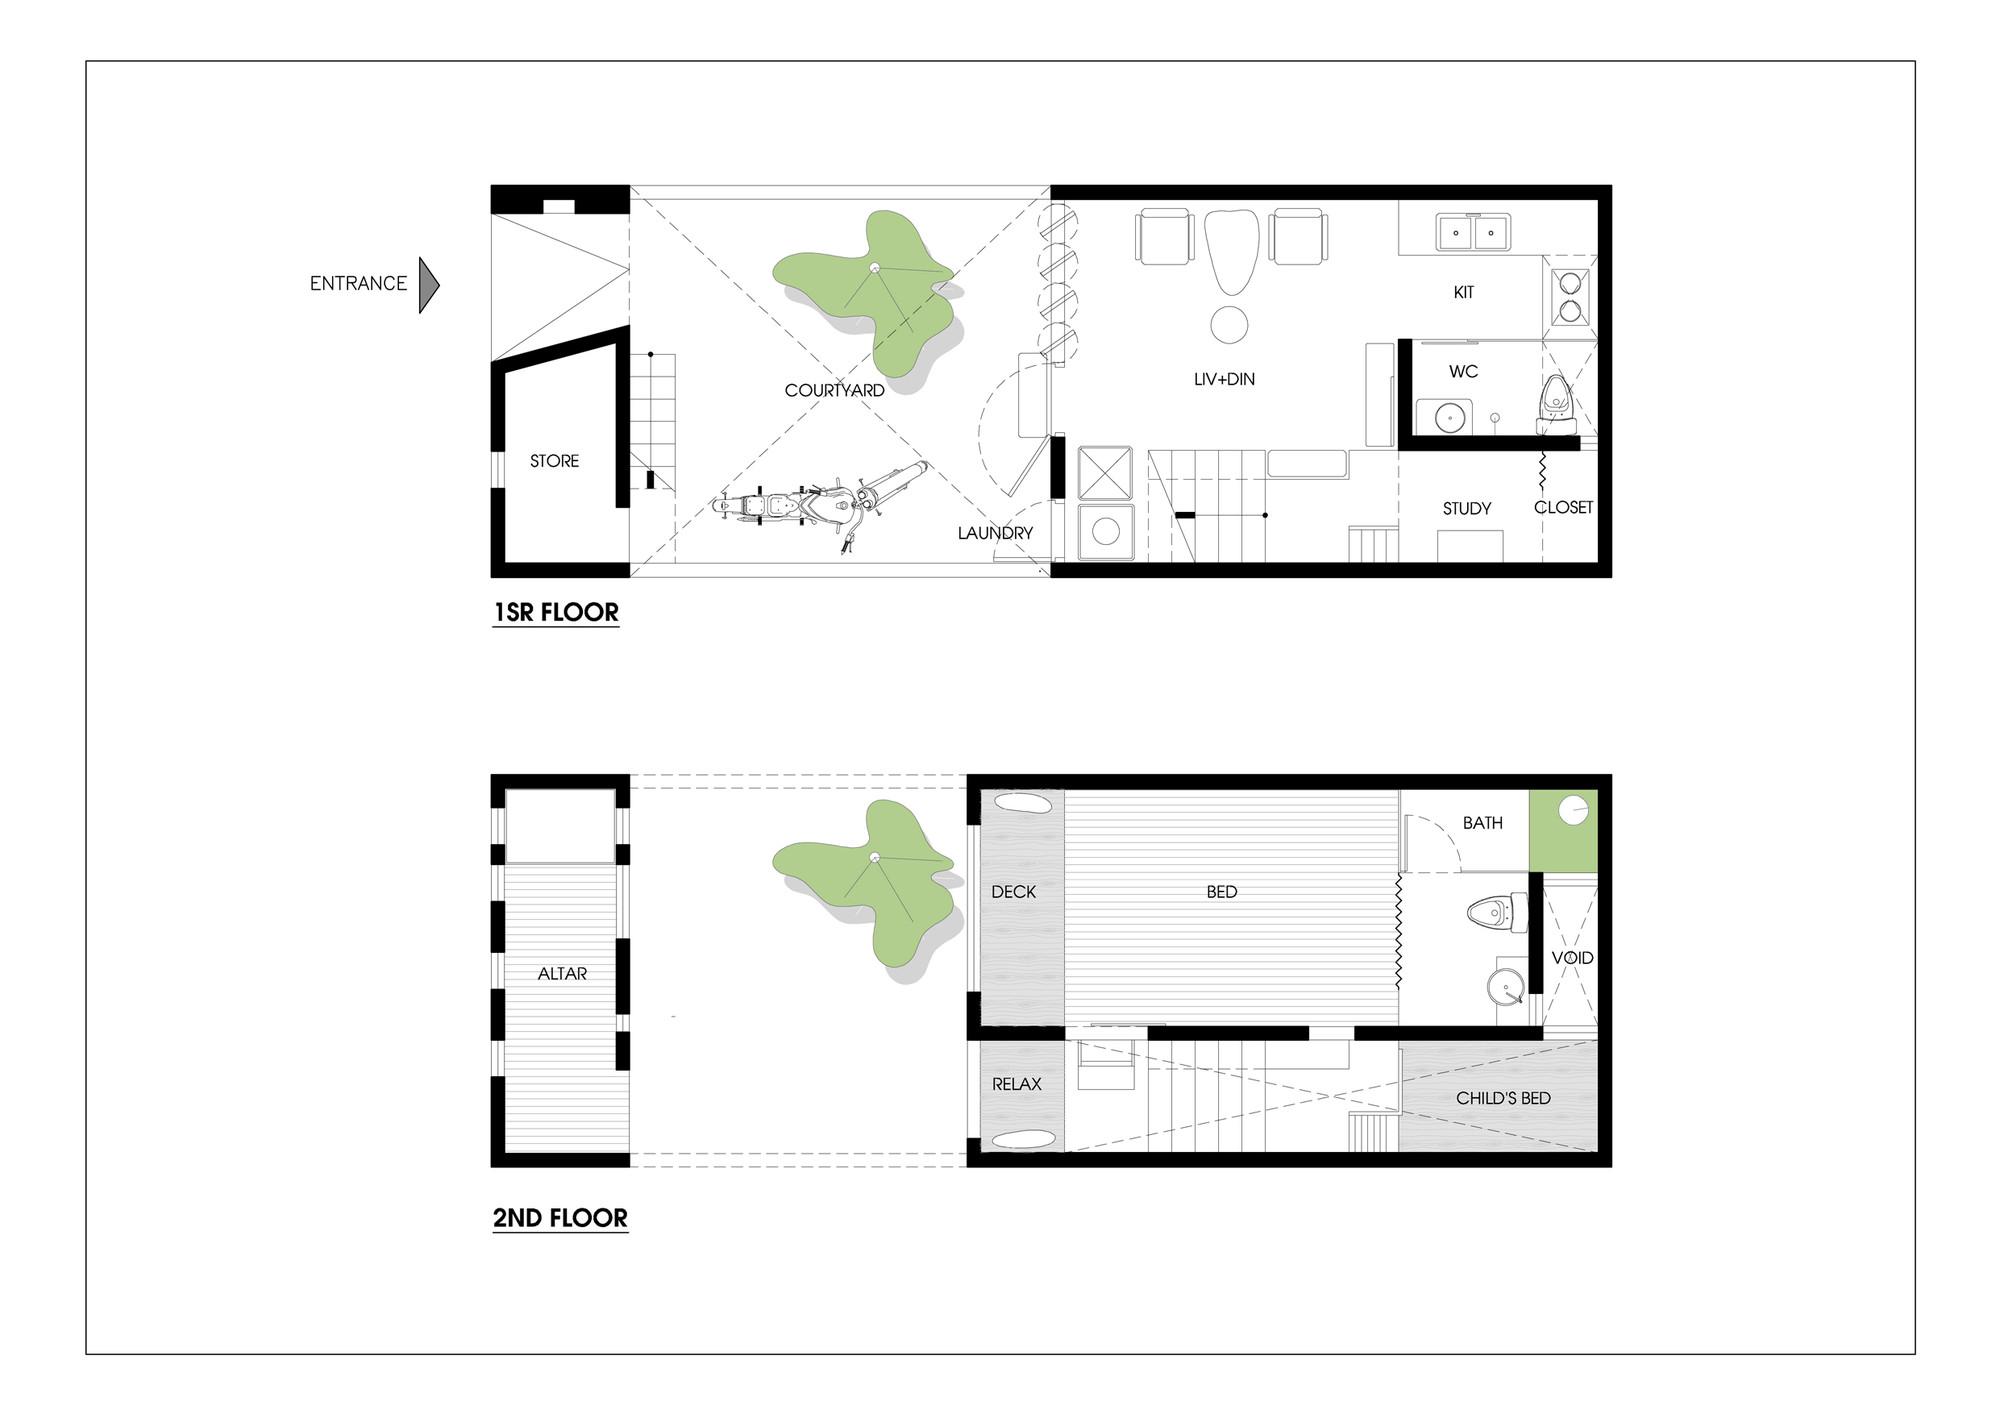 Tremendous Kn House Adrei Studio Architecture Archdaily Largest Home Design Picture Inspirations Pitcheantrous